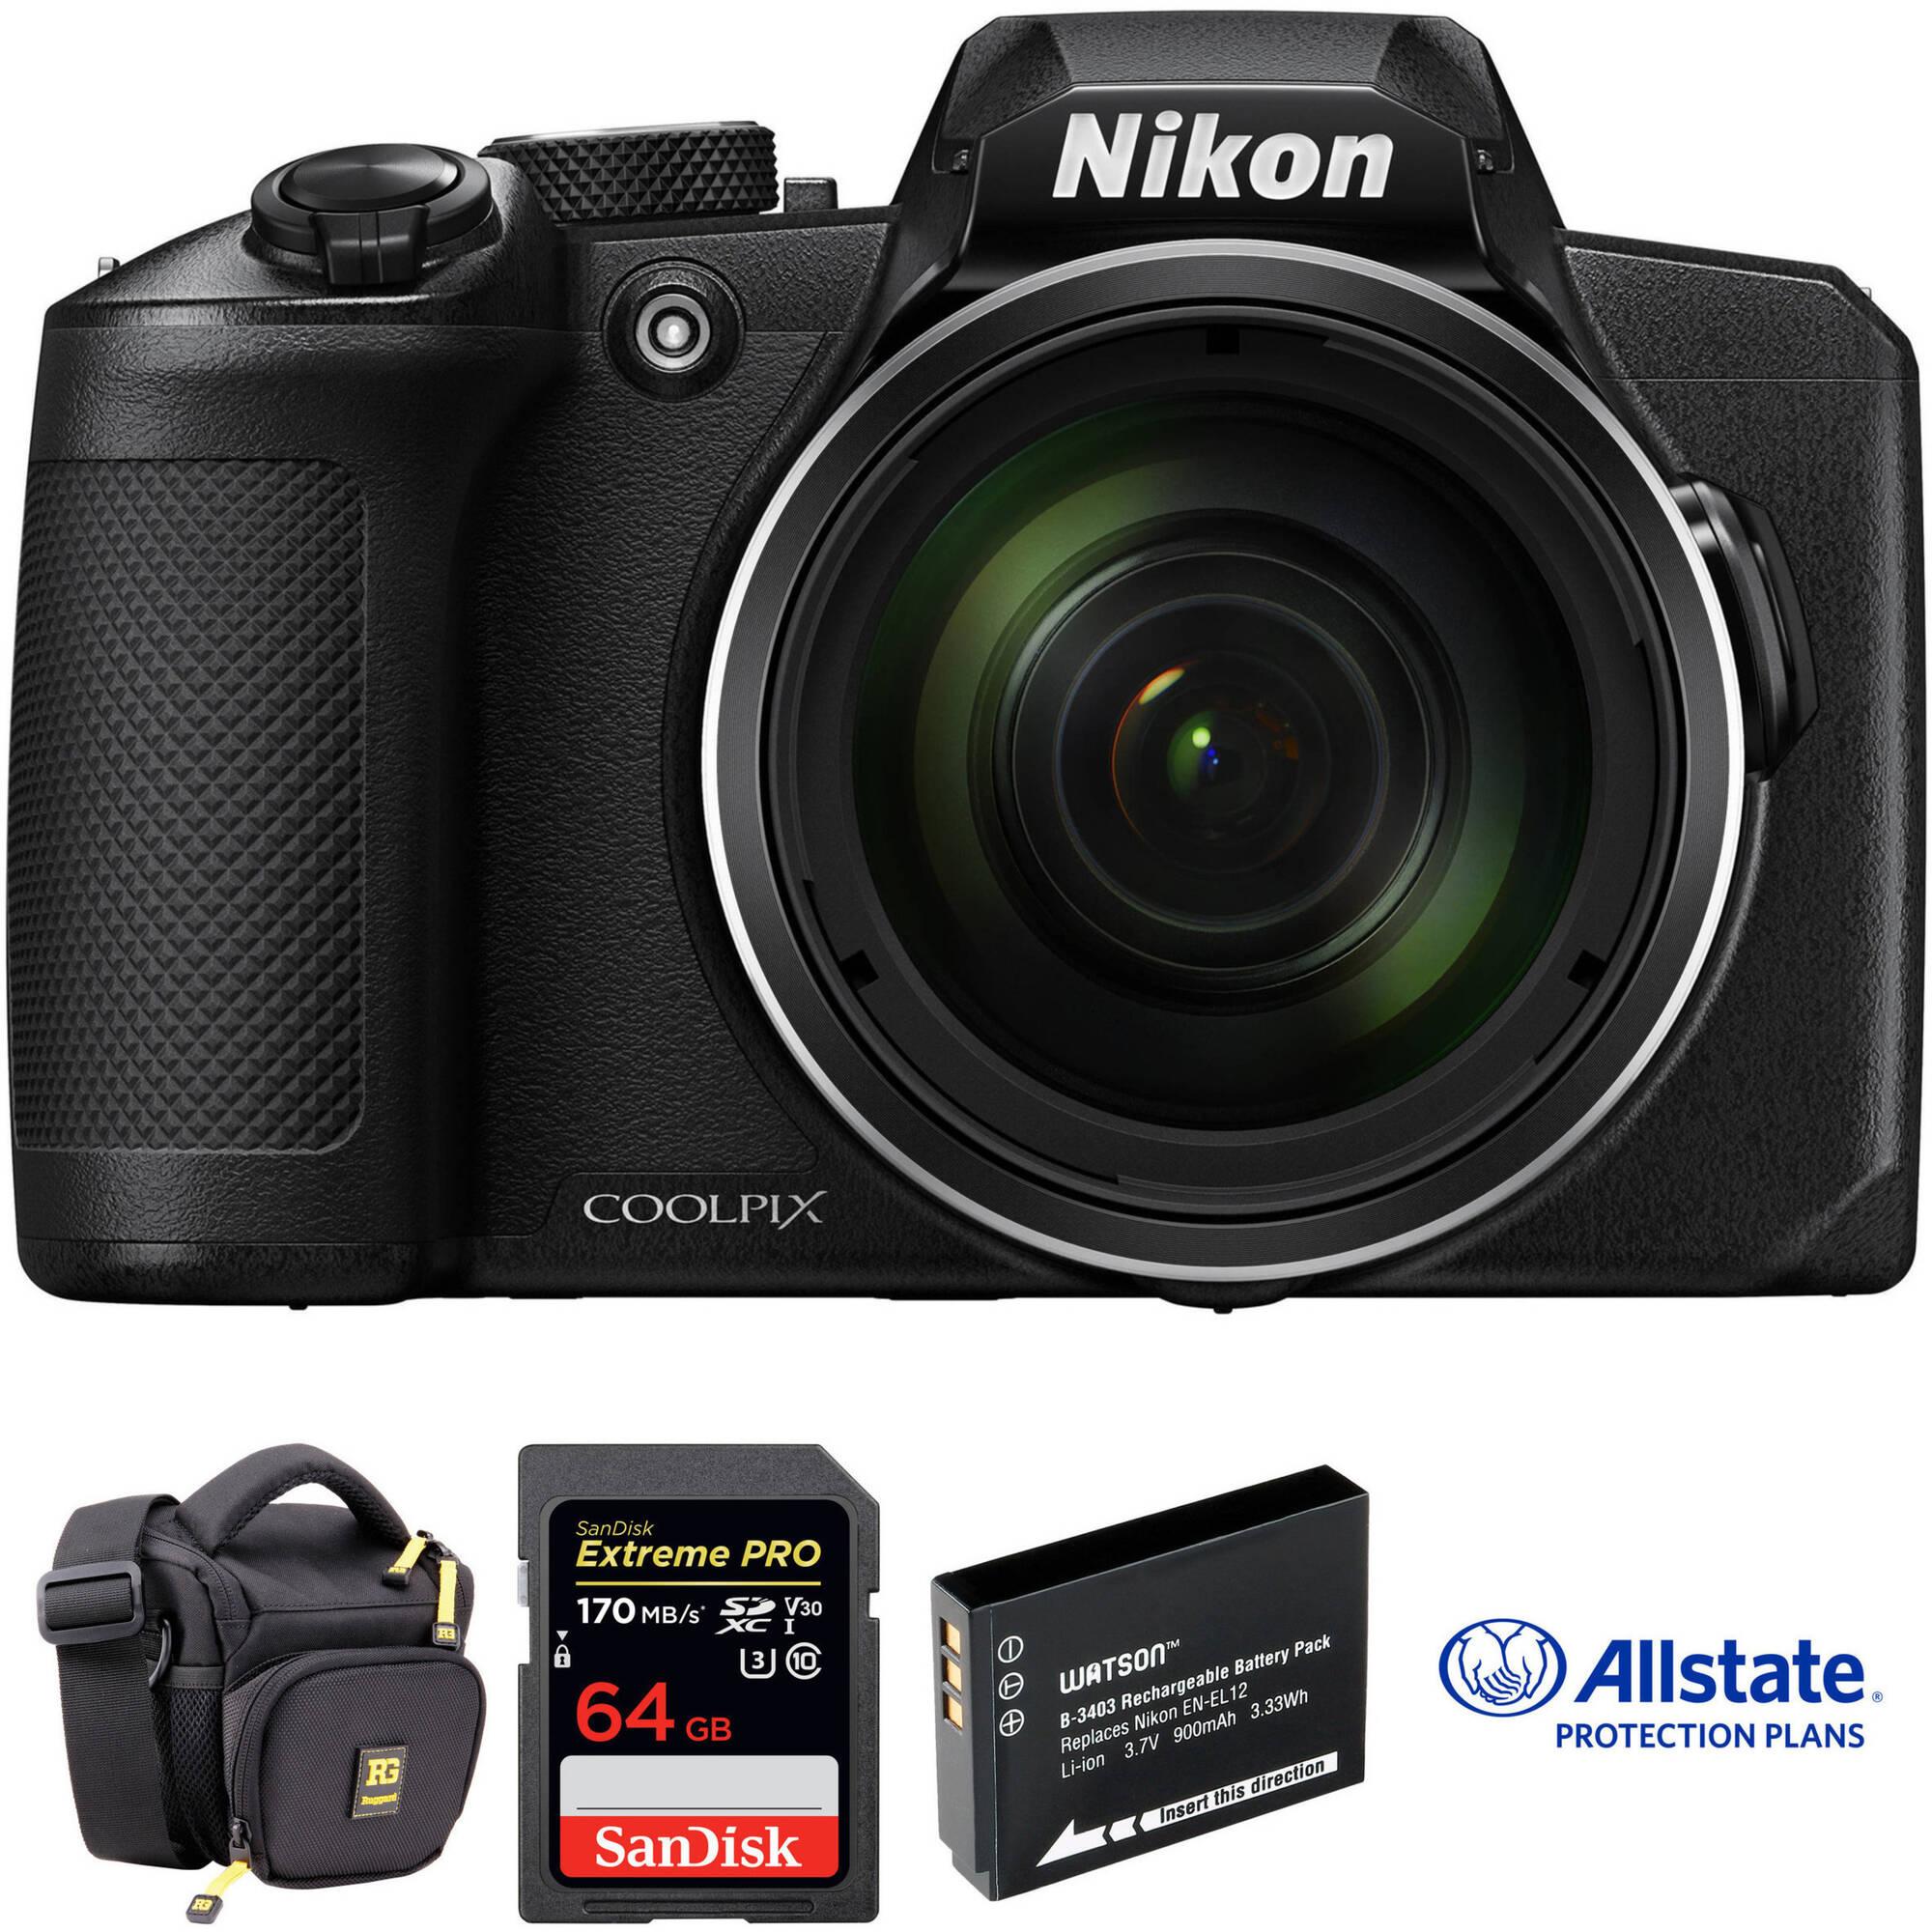 32GB Memory Card for Nikon Coolpix P310 Digital Camera